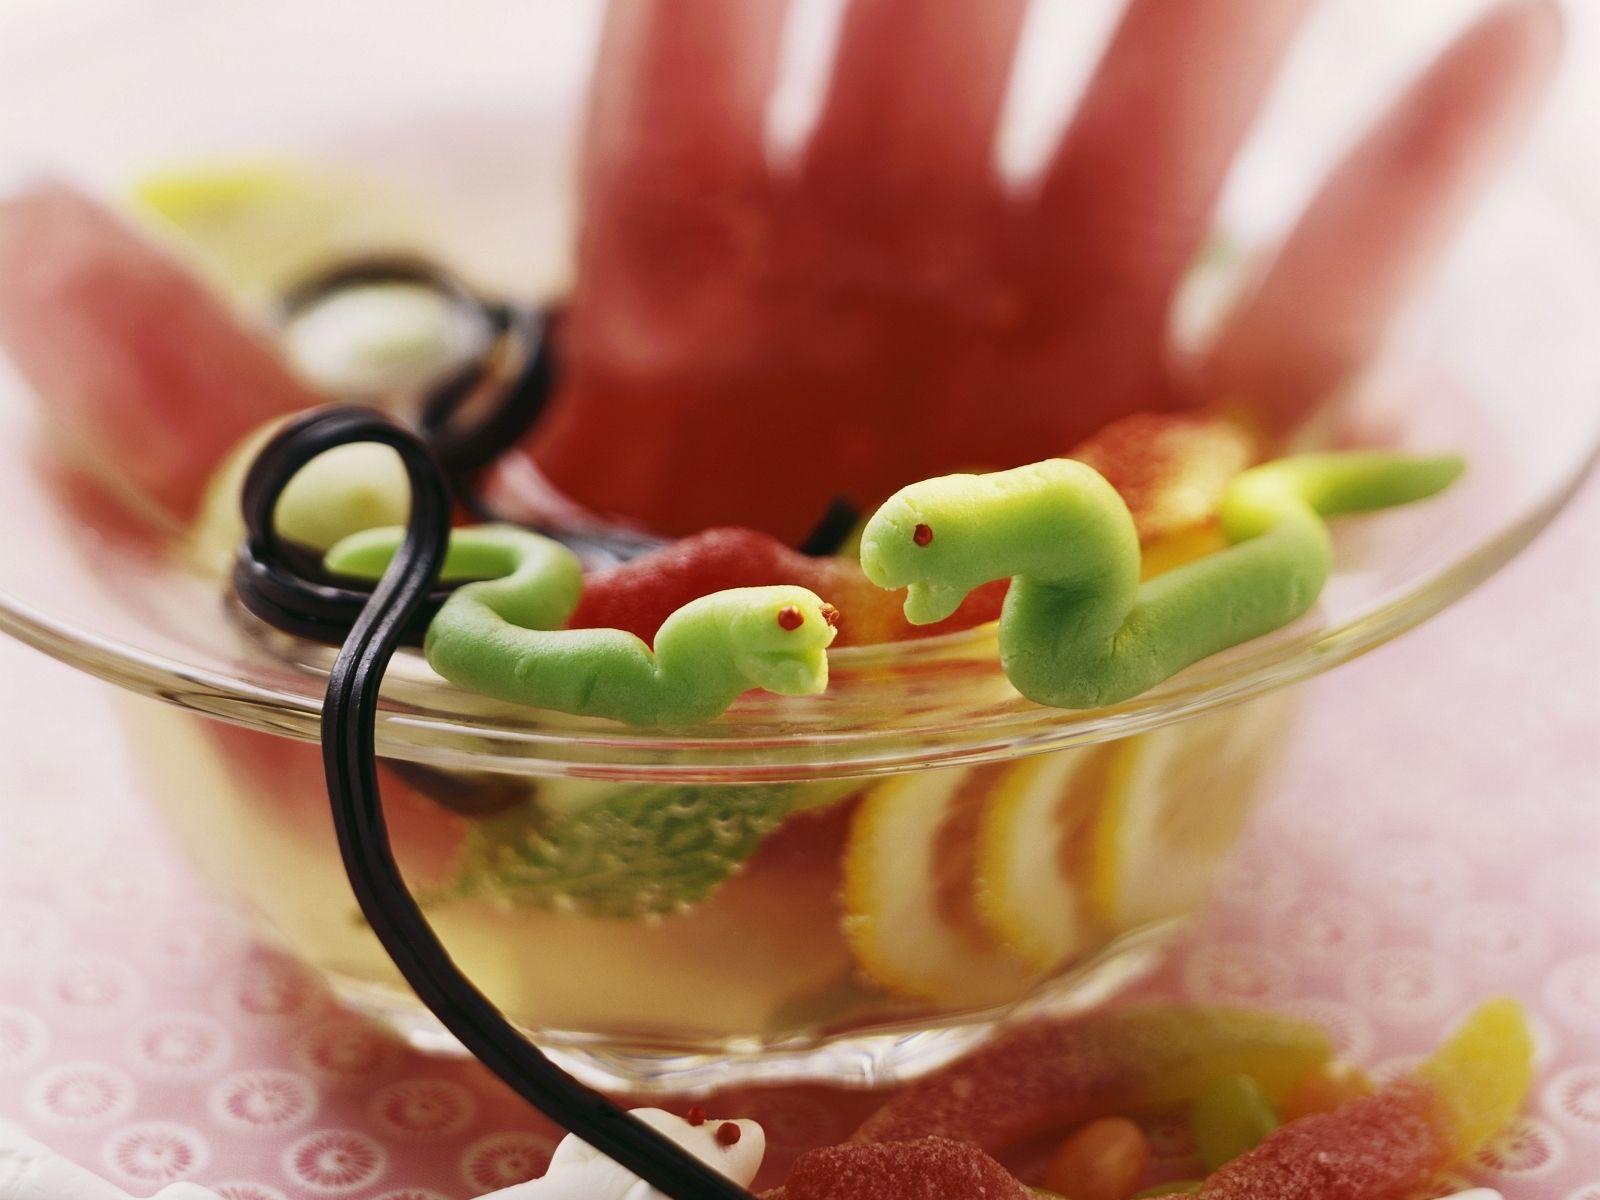 Halloween-Bowle mit Marzipanschlangen Rezept | EAT SMARTER